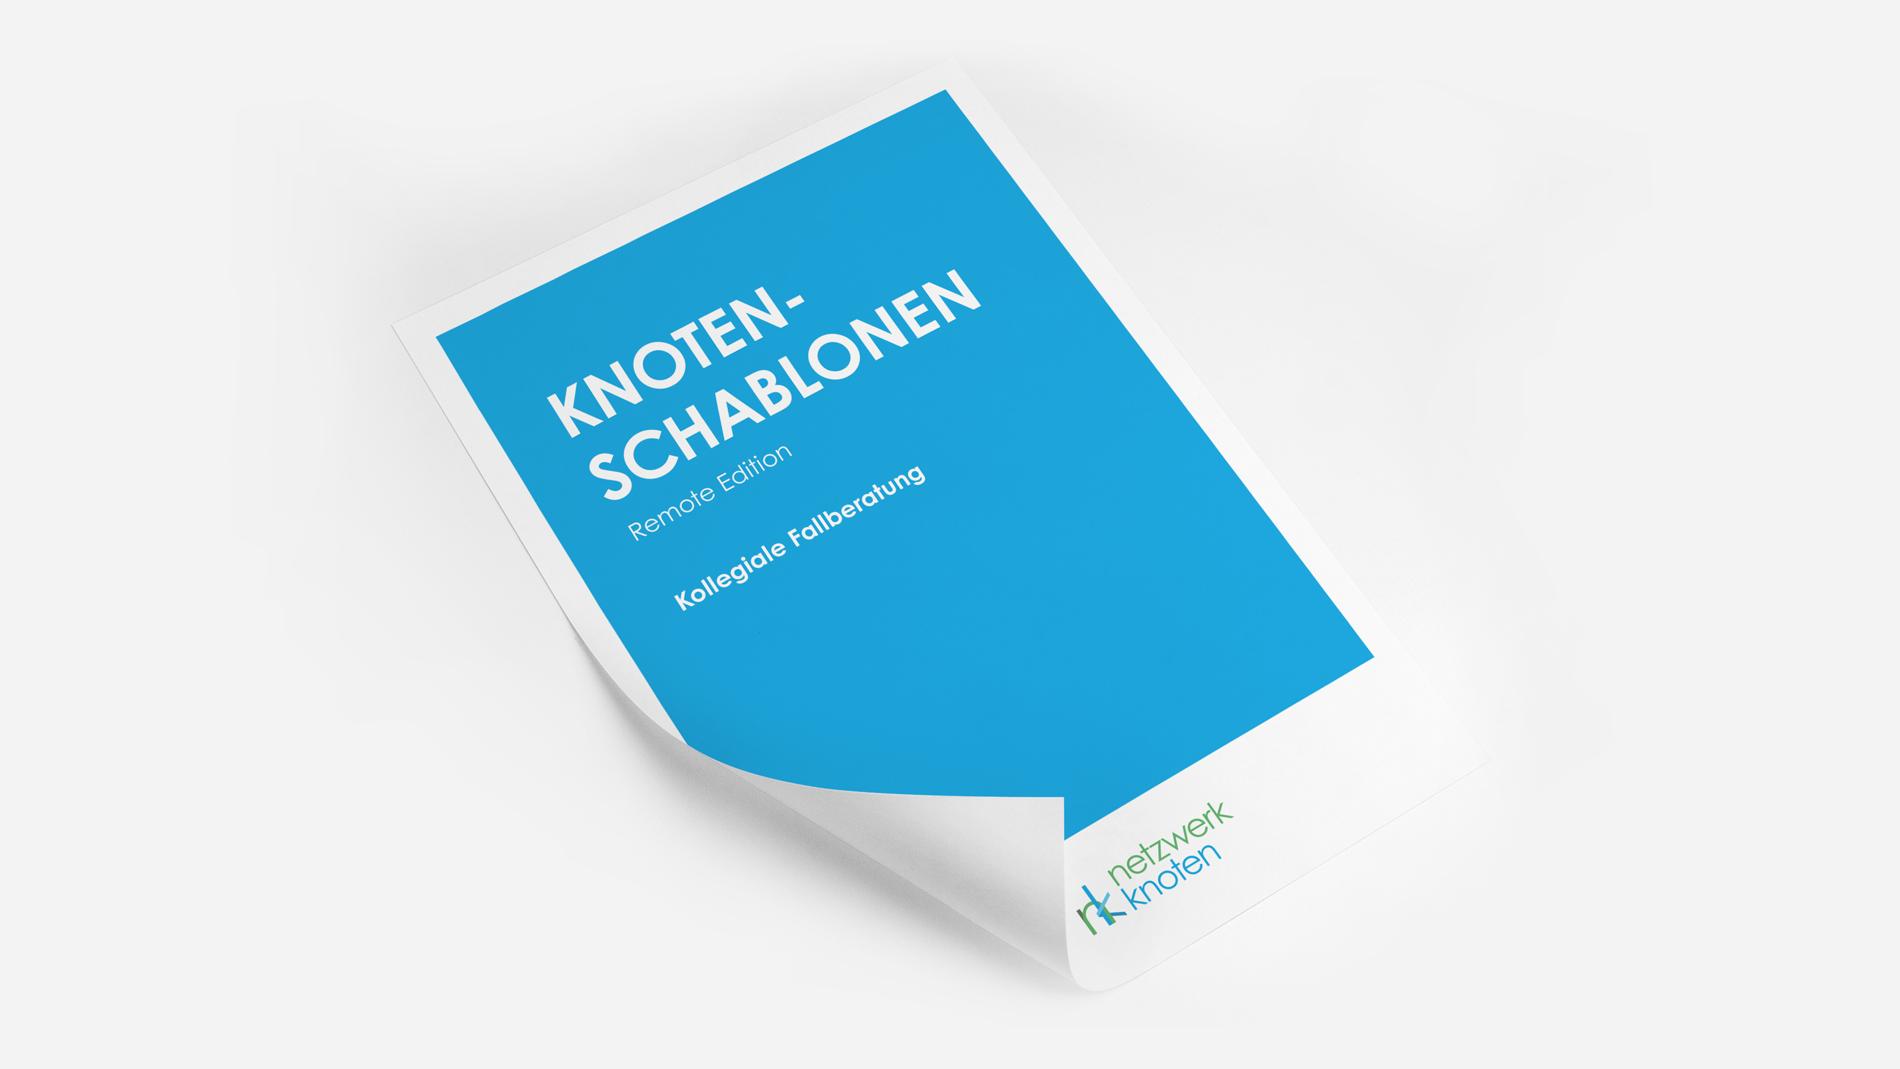 netzwerkknoten_unternehmensberatung_berlin_knotenschoten_kollegiale_fallberatung